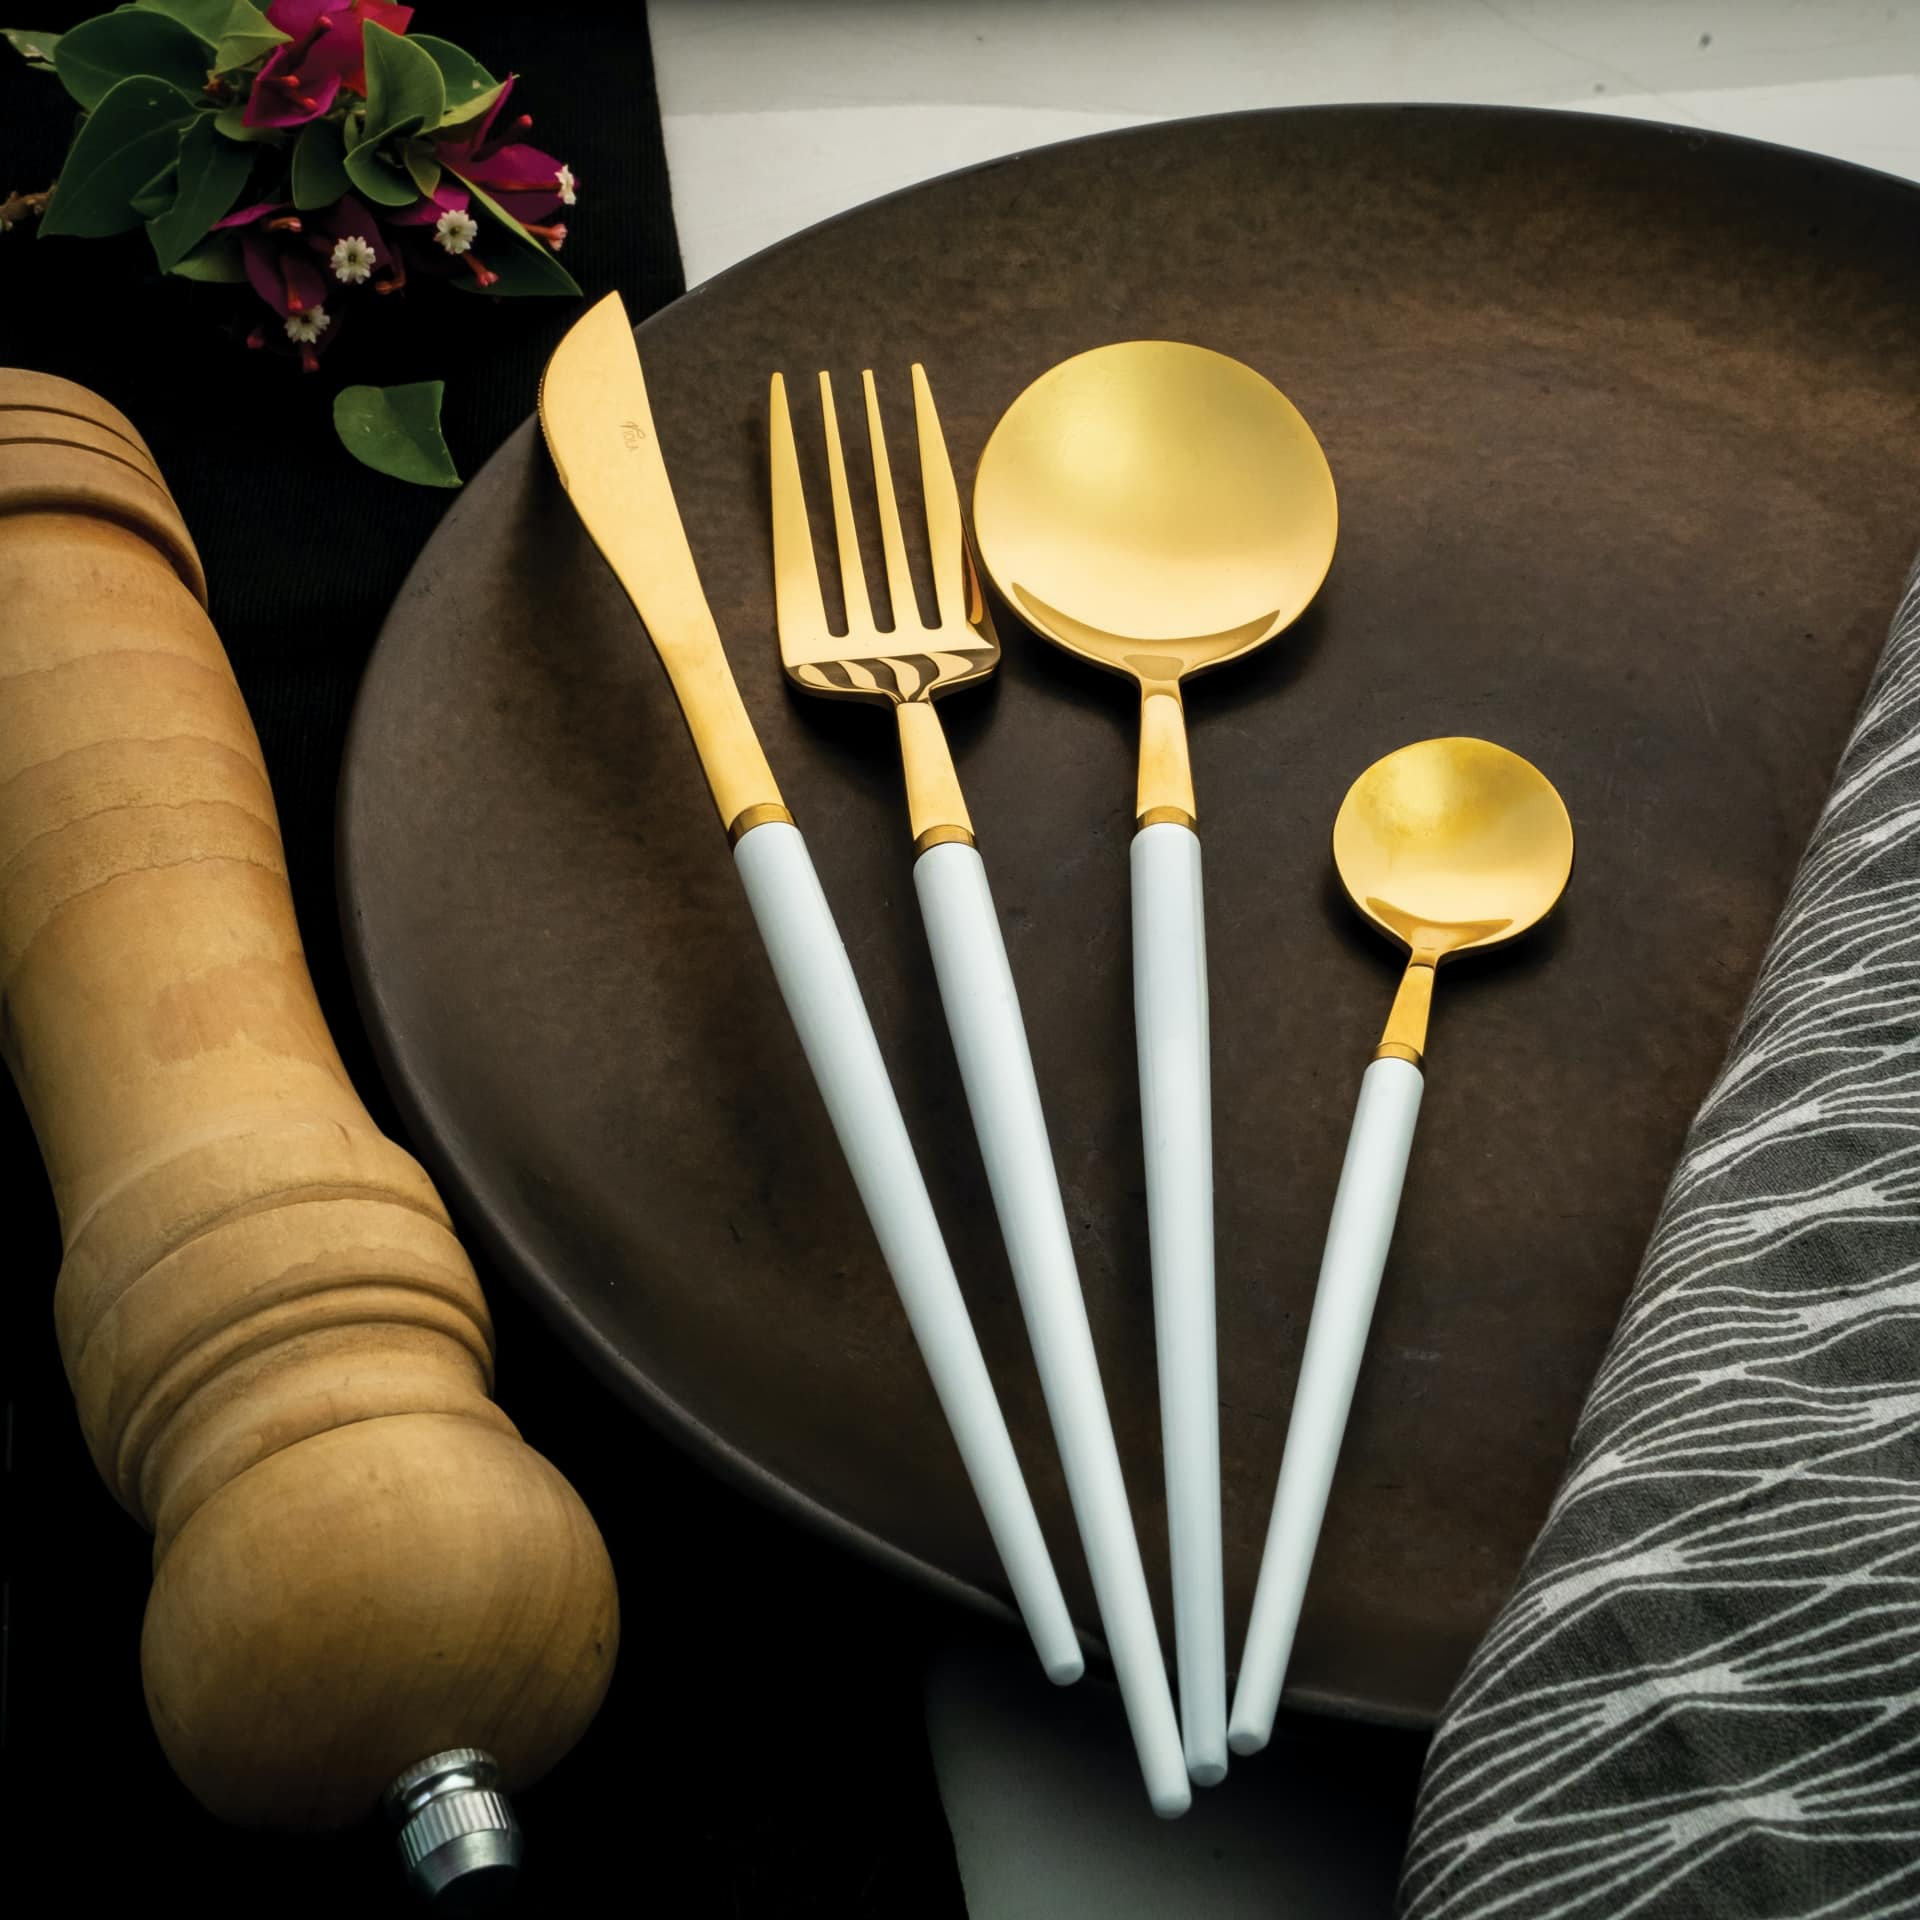 Viola Candescent Cutlery Set